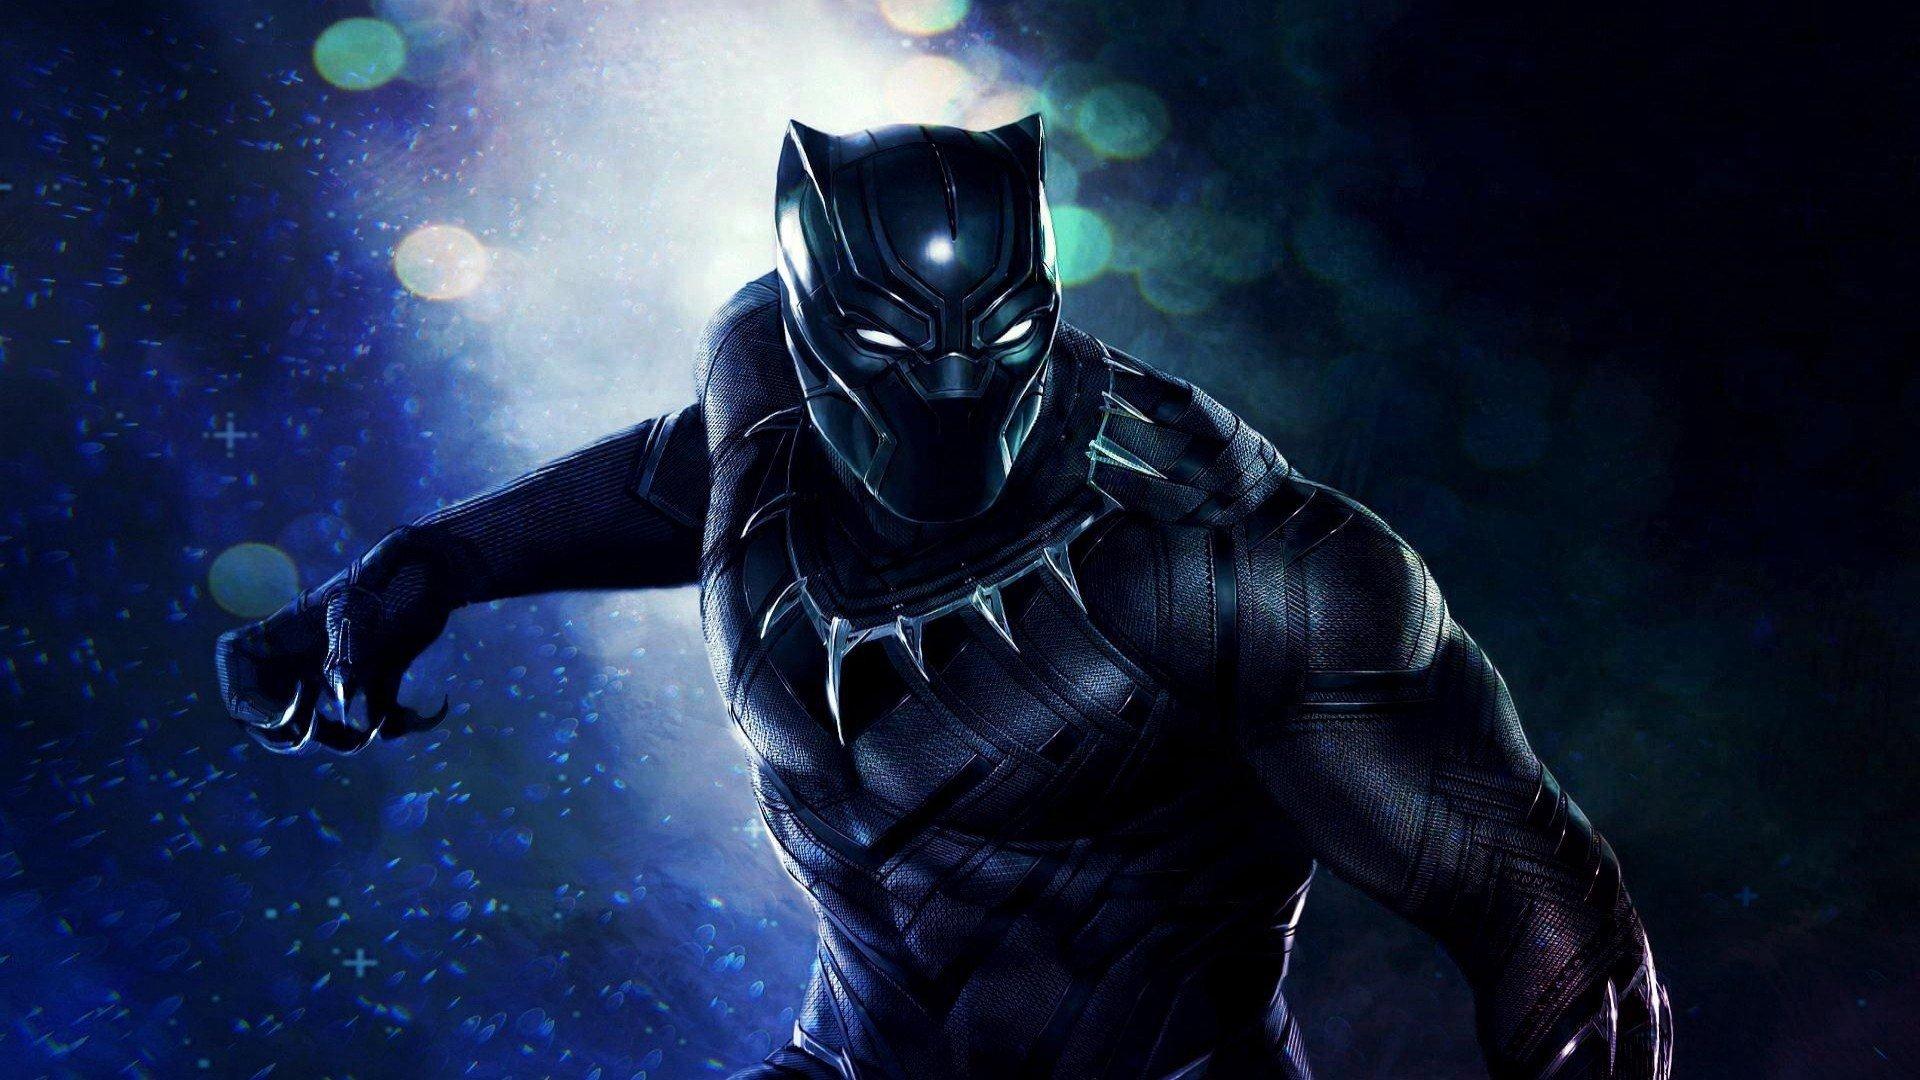 BLACK PANTHER: Best Marvel Movies